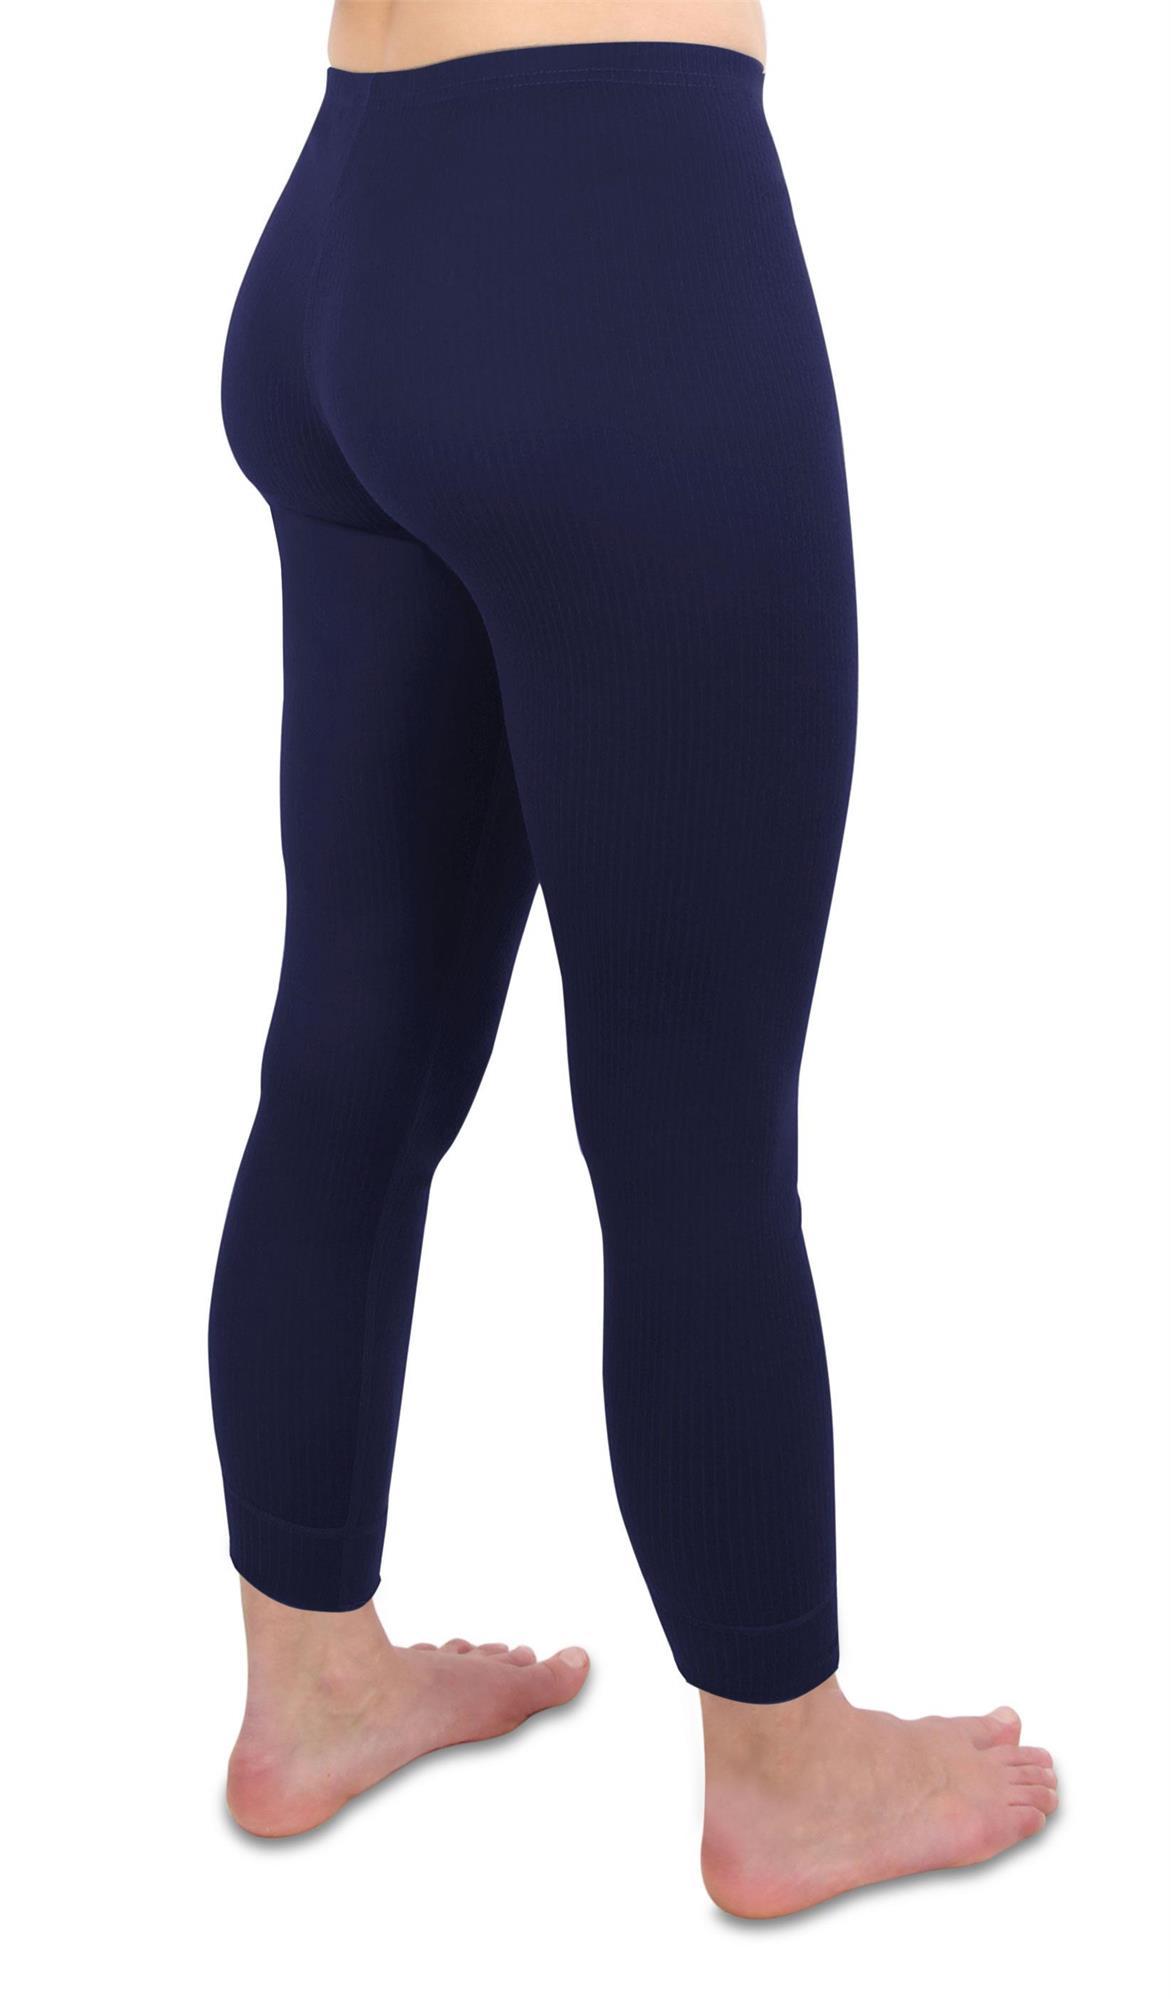 Damen Thermounterwäsche Unterhose Leggins Skiunterhose Winterhose Frauen Hose